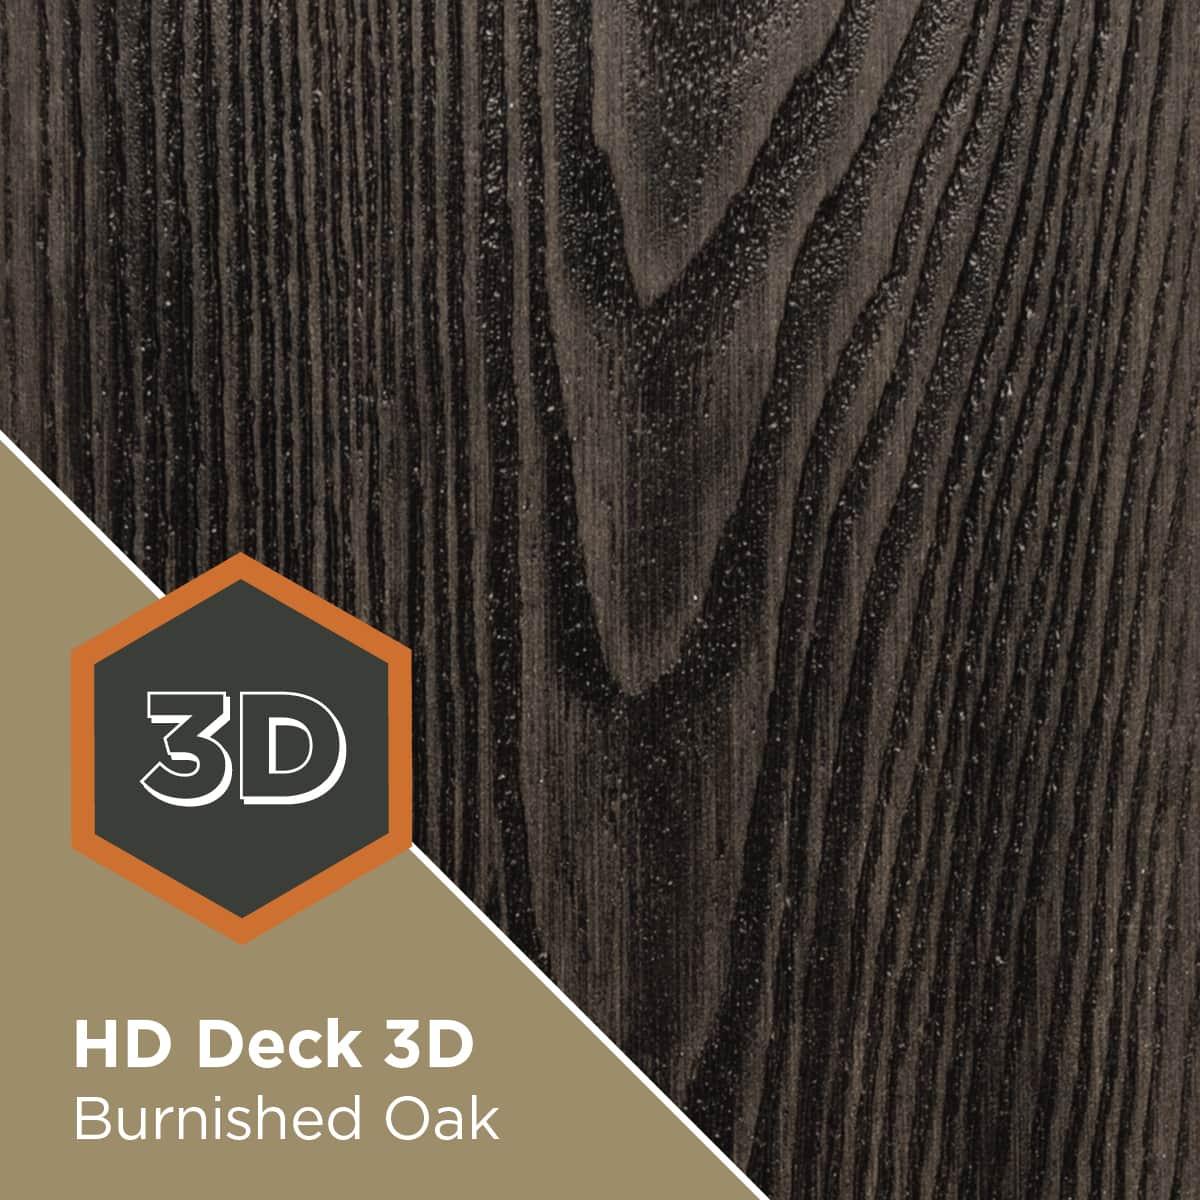 HD Deck 3D Burnished Oak